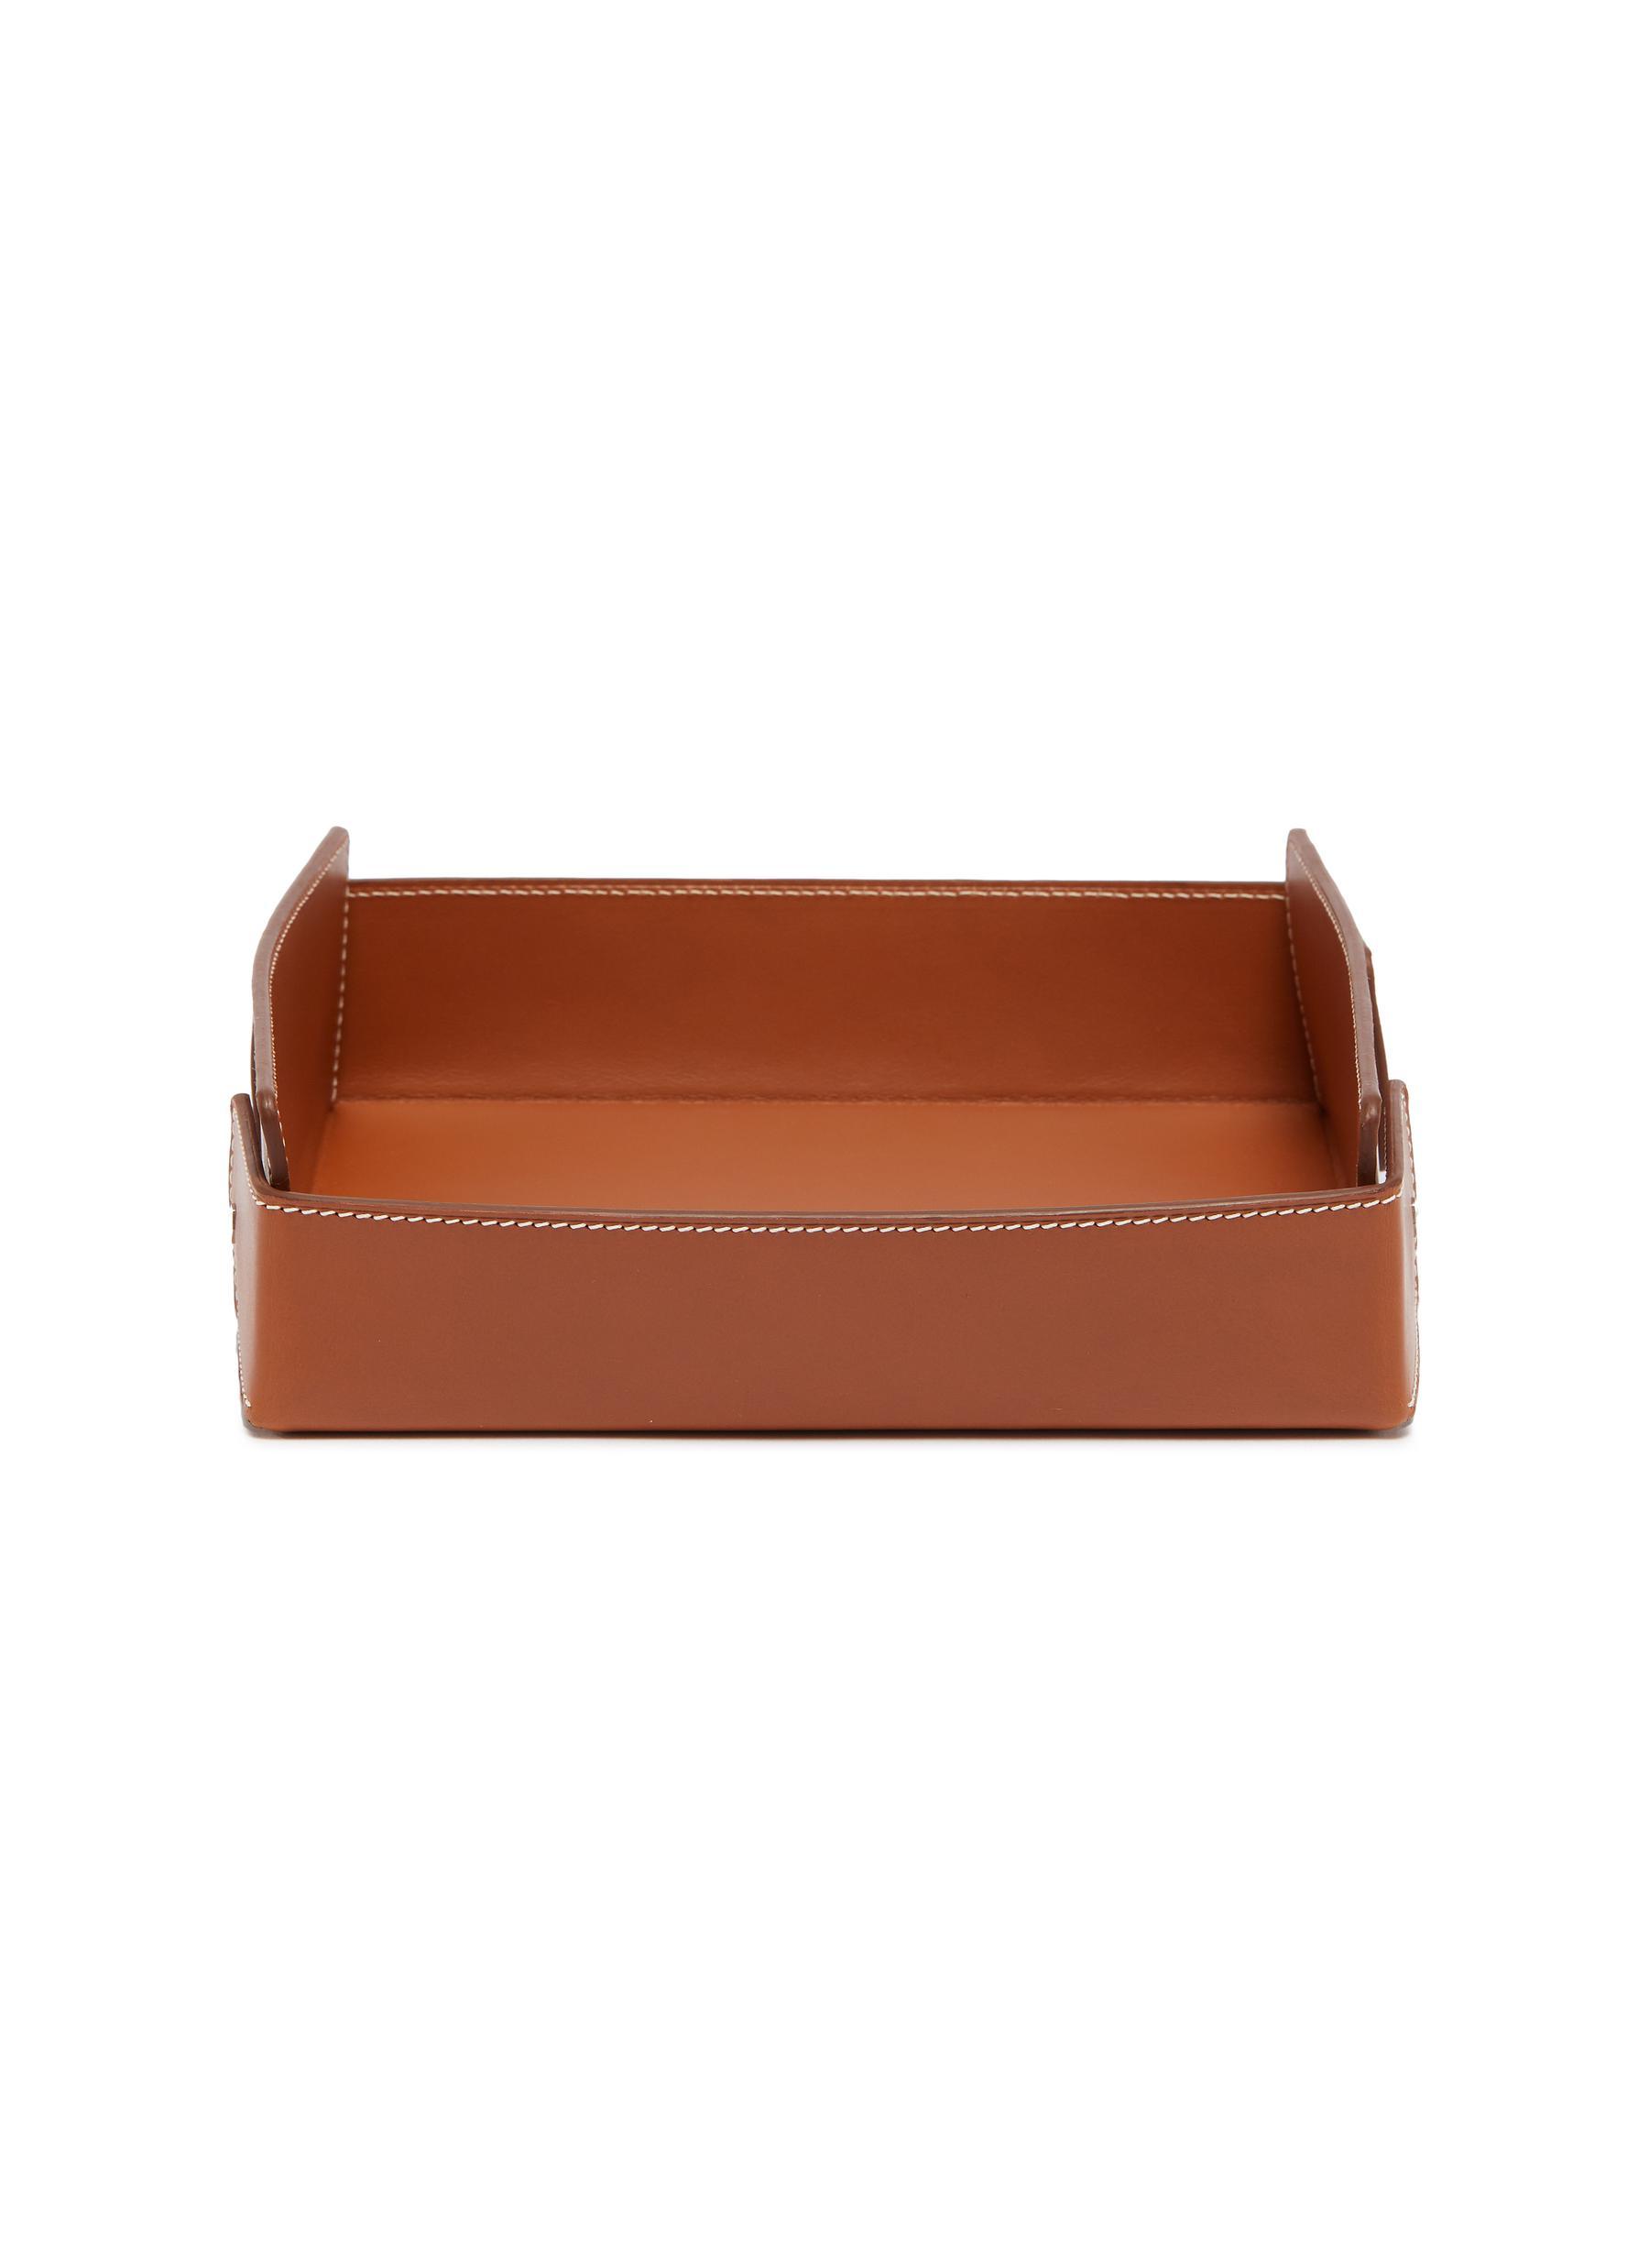 Large leather desk tray